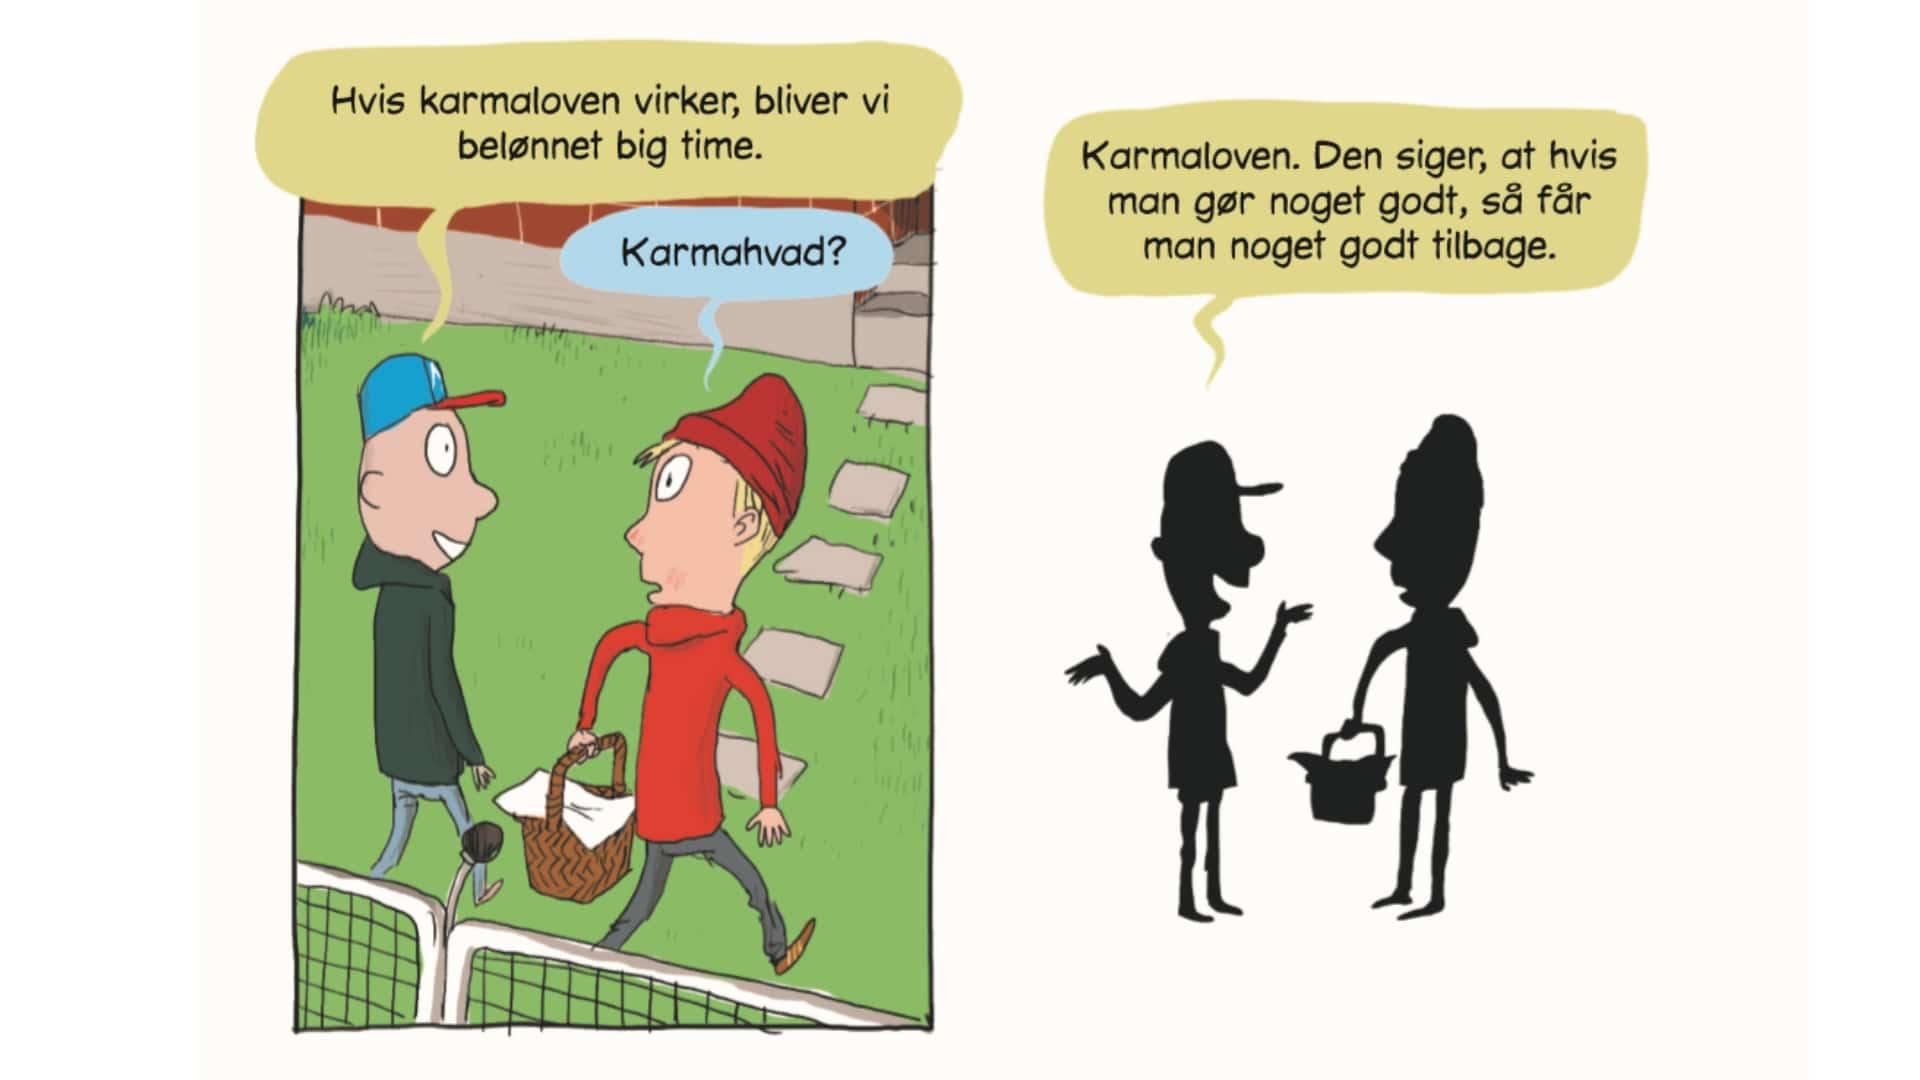 Tegneserie, tegneseriebog, børnebog, humor, Kim Fupz Aakeson, Rasmus Bregnhøi